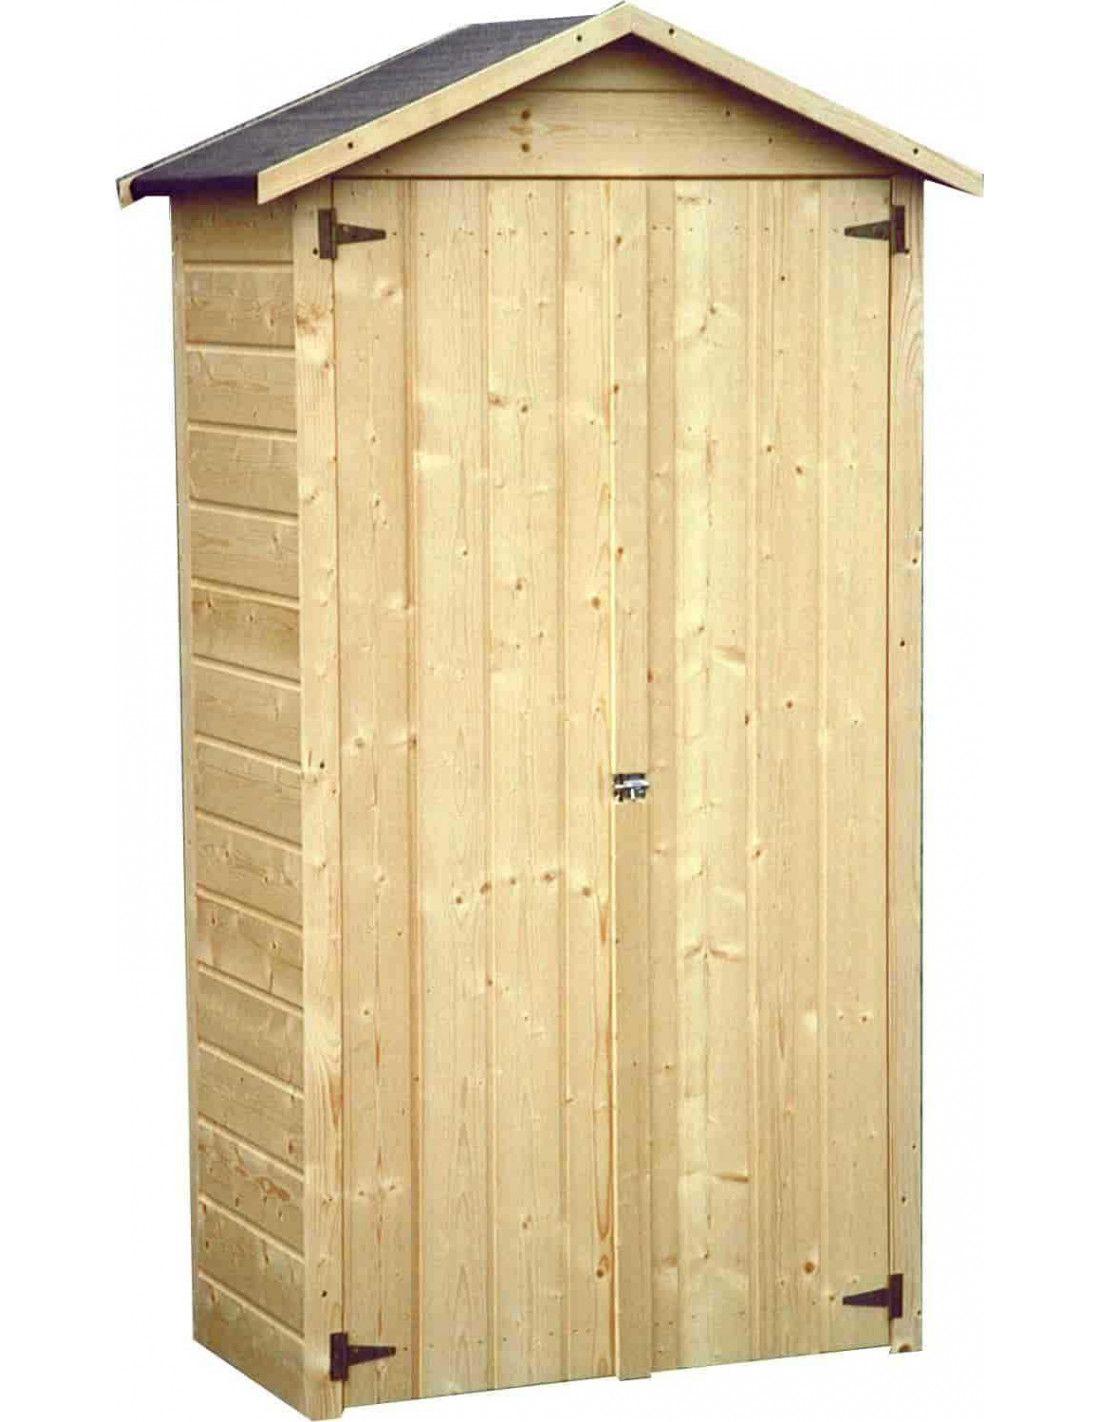 Armarios de exterior armario de madera mod bora 92x51cm - Armario de plastico para exterior ...